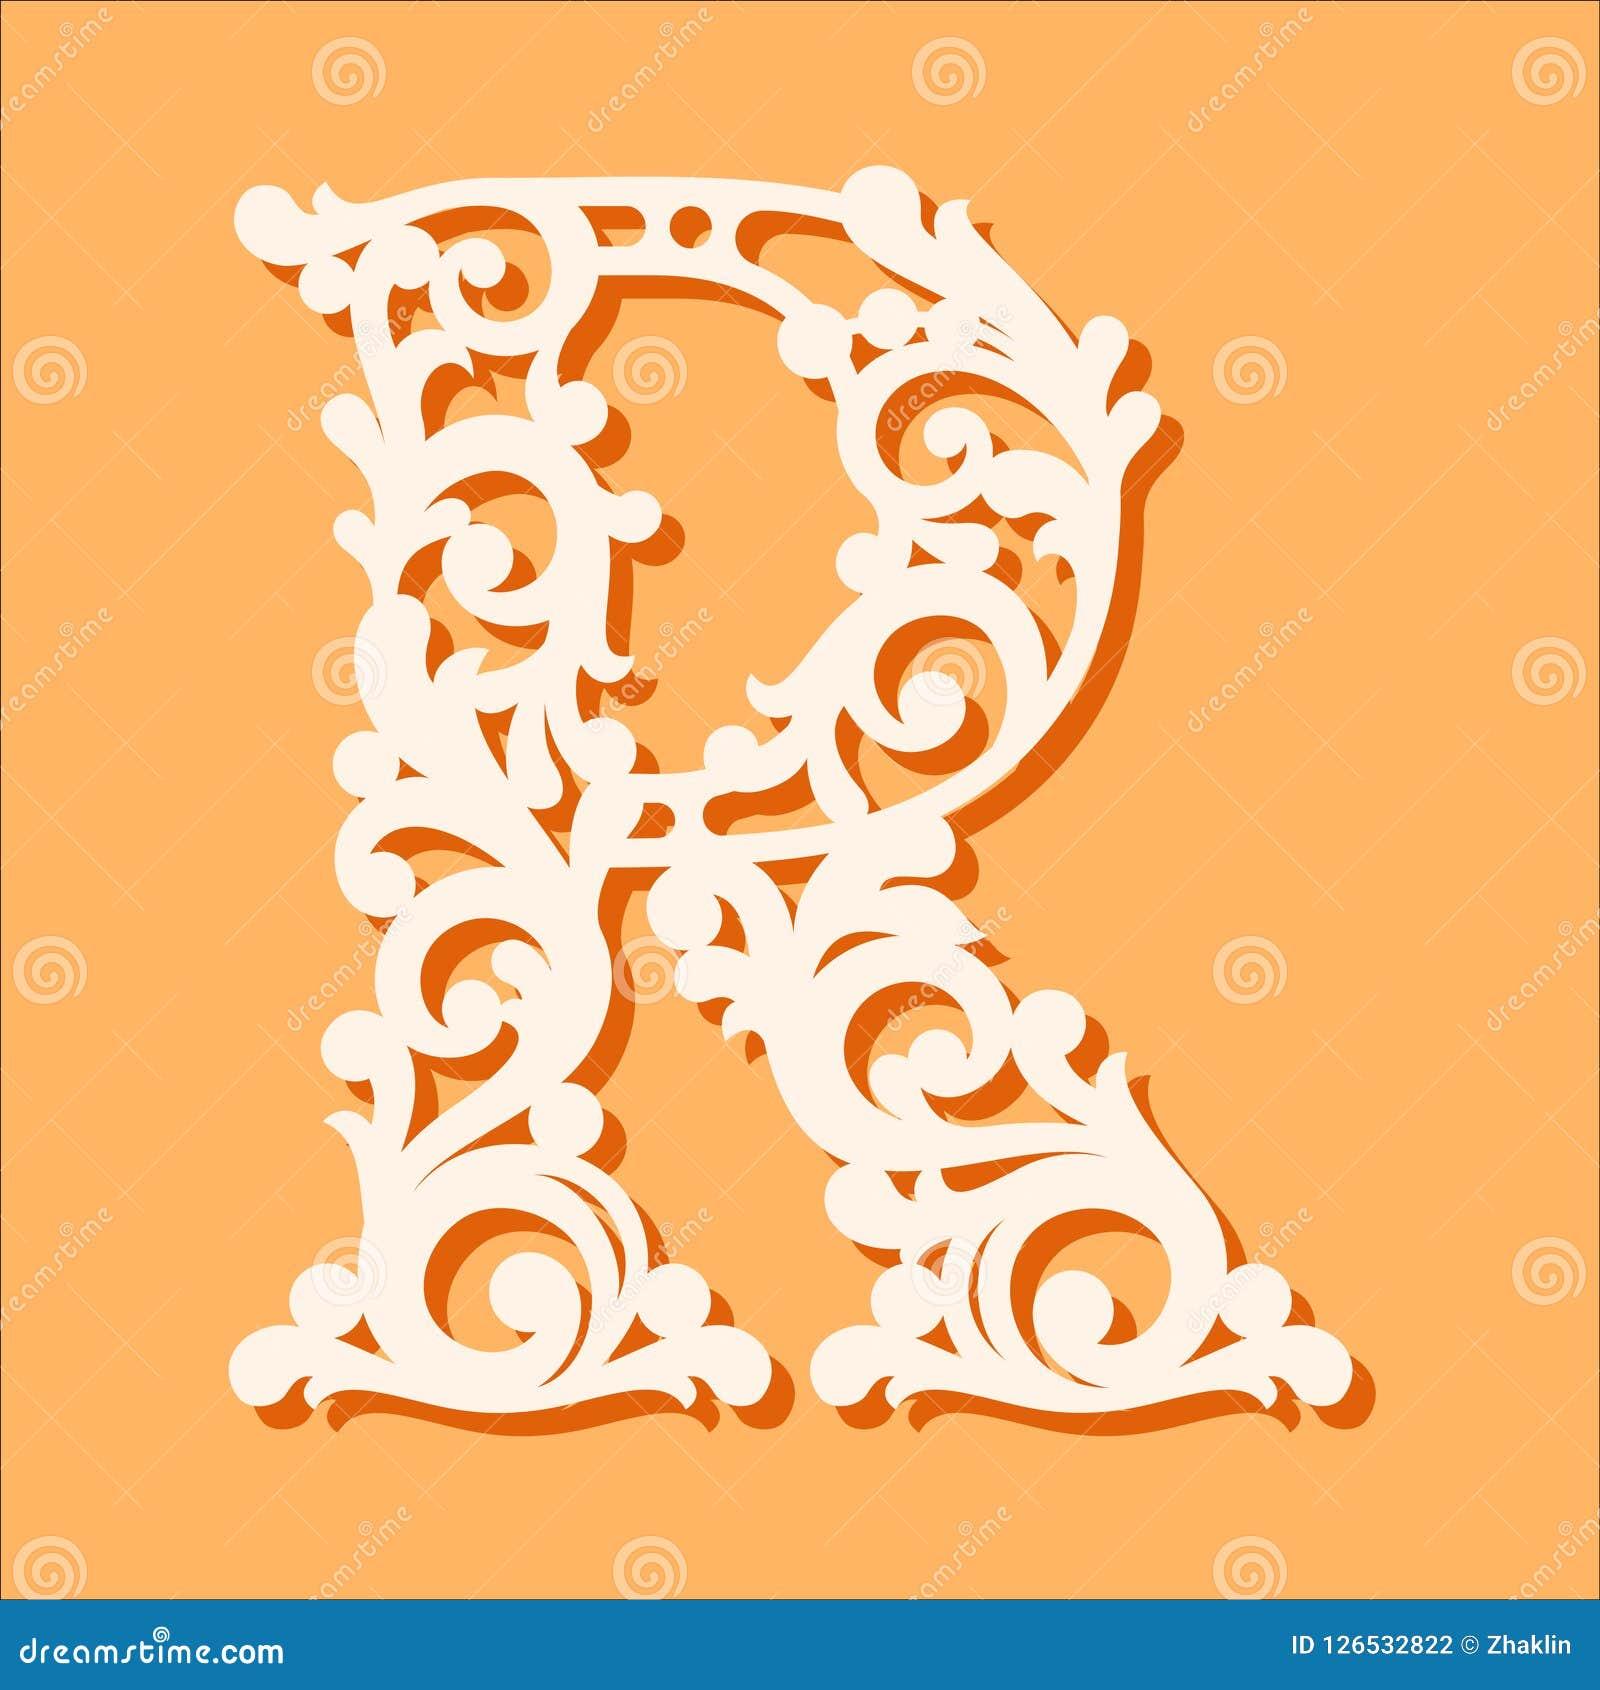 Laser cut template initial monogram letters fancy floral alphabet download laser cut template initial monogram letters fancy floral alphabet letter stock vector maxwellsz